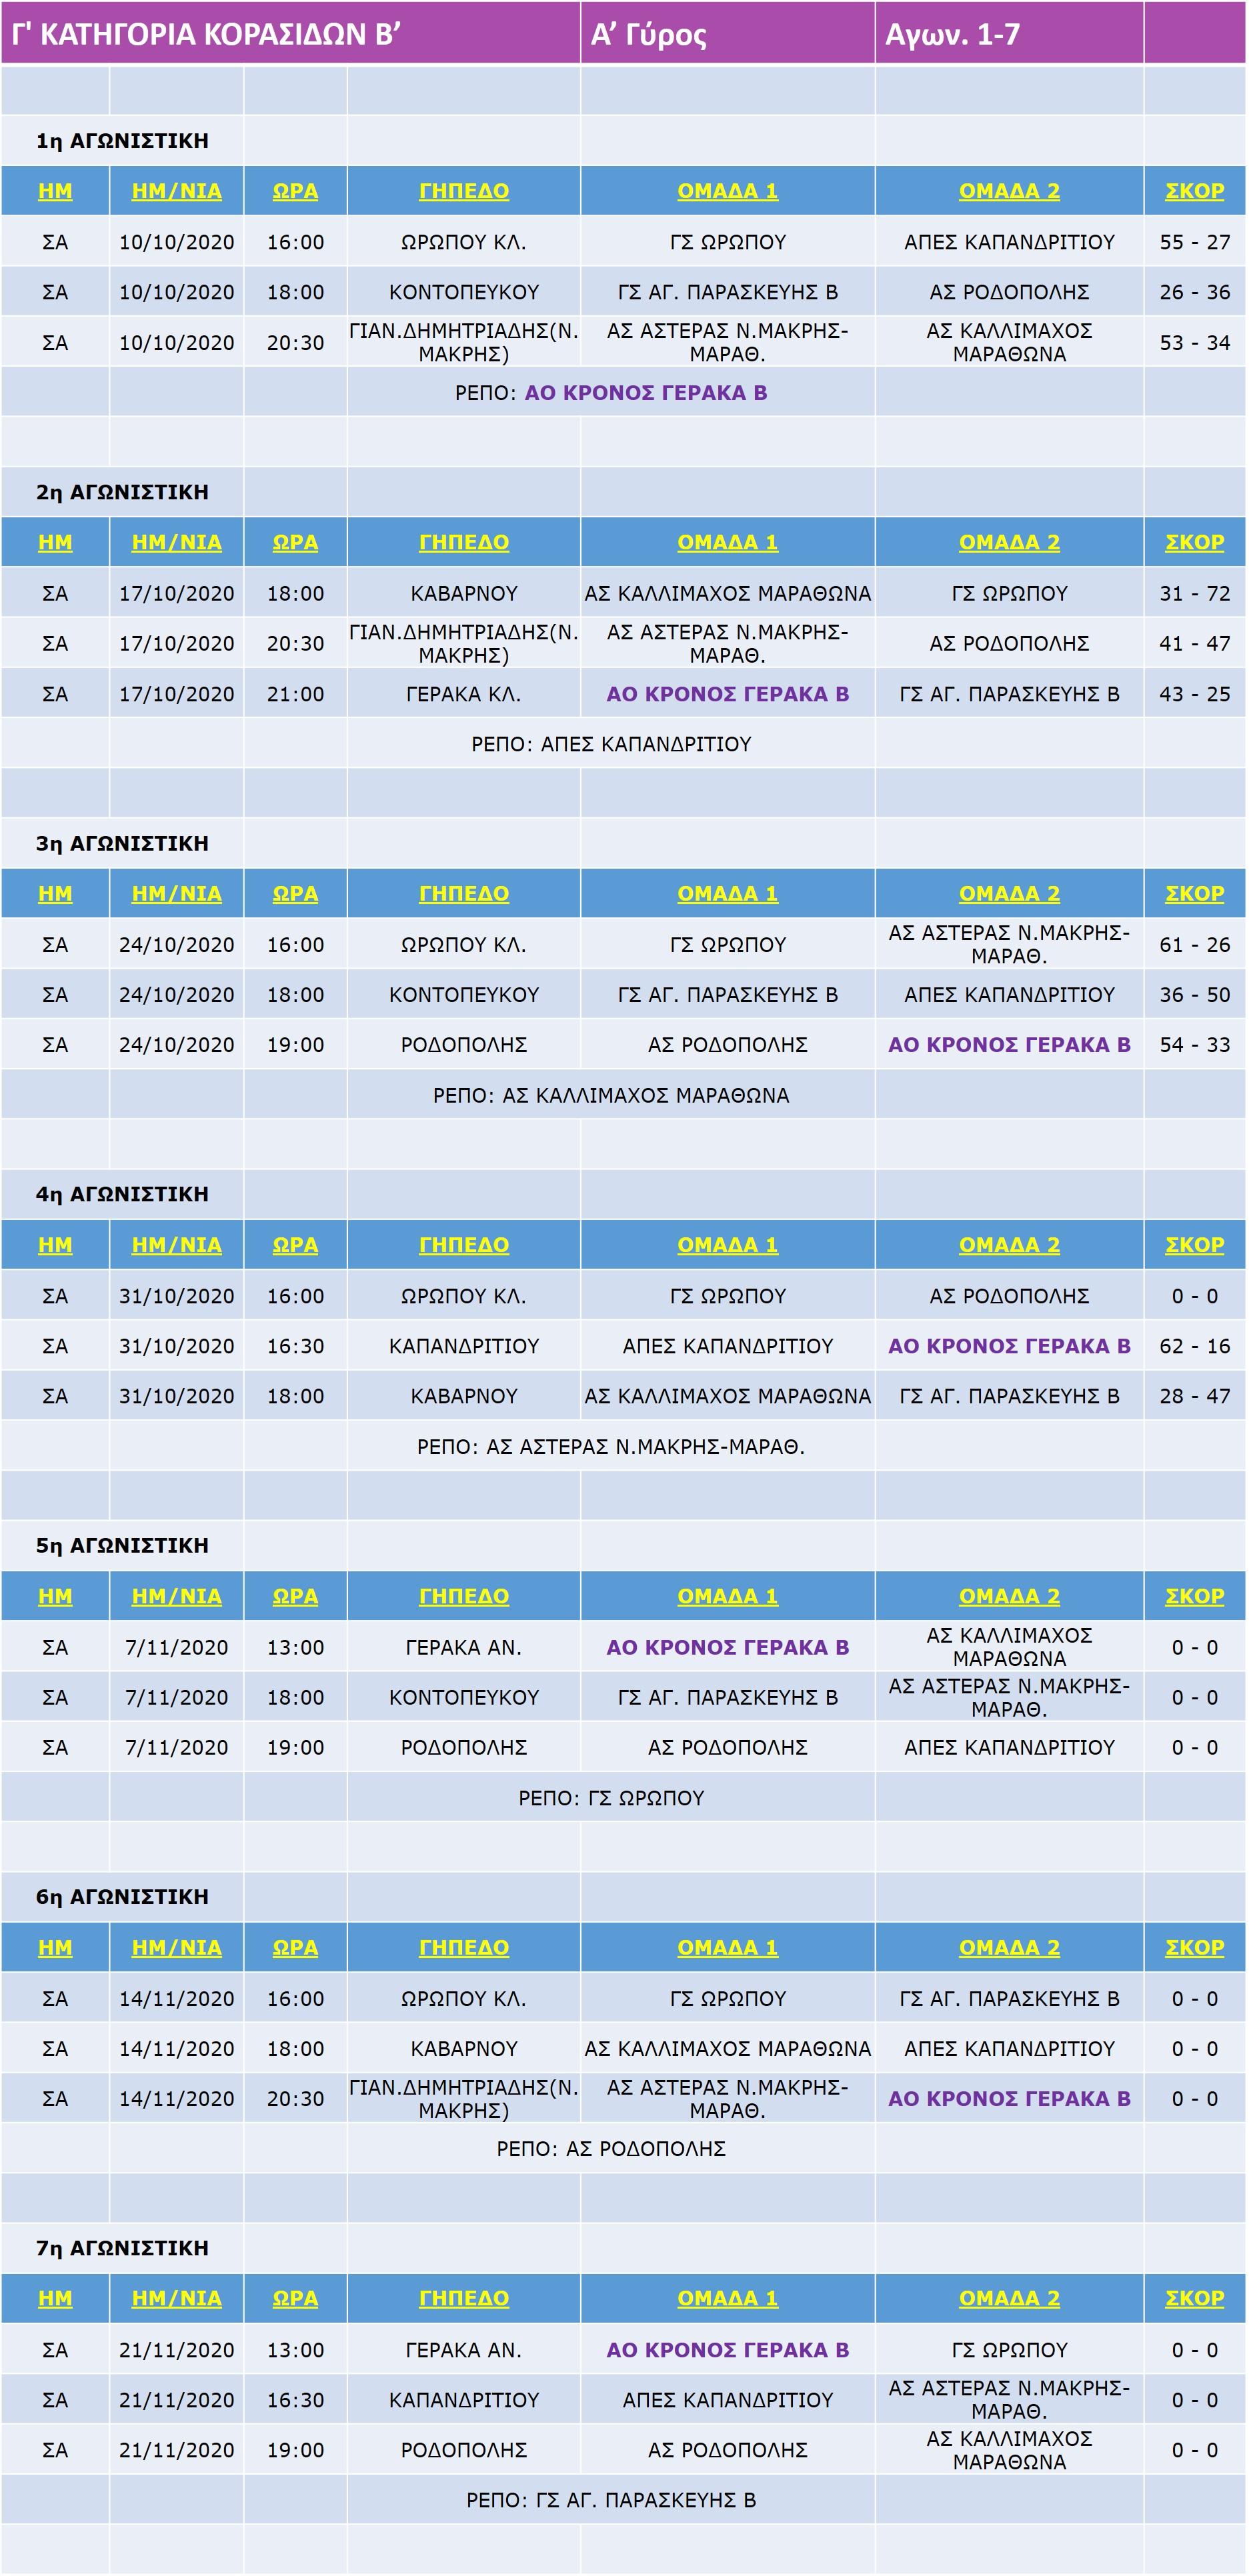 Korasides_B_Match_1-7-4